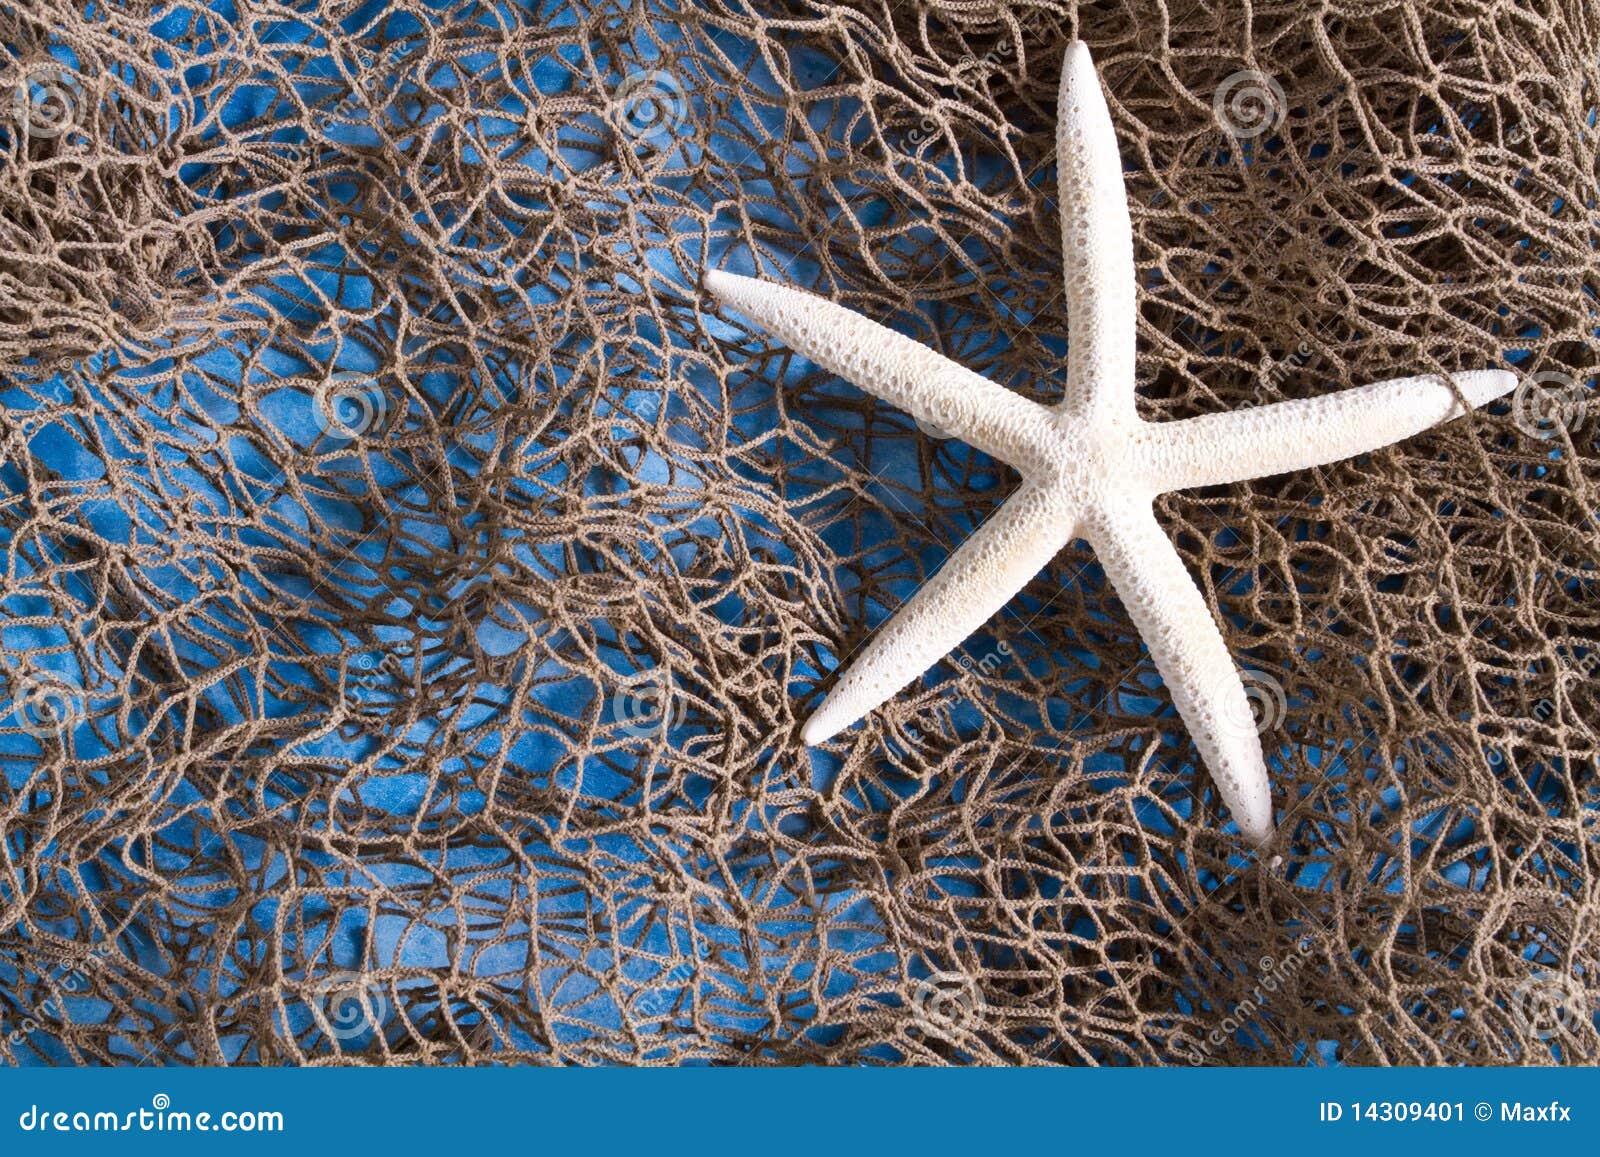 Estrela de mar na rede de pesca